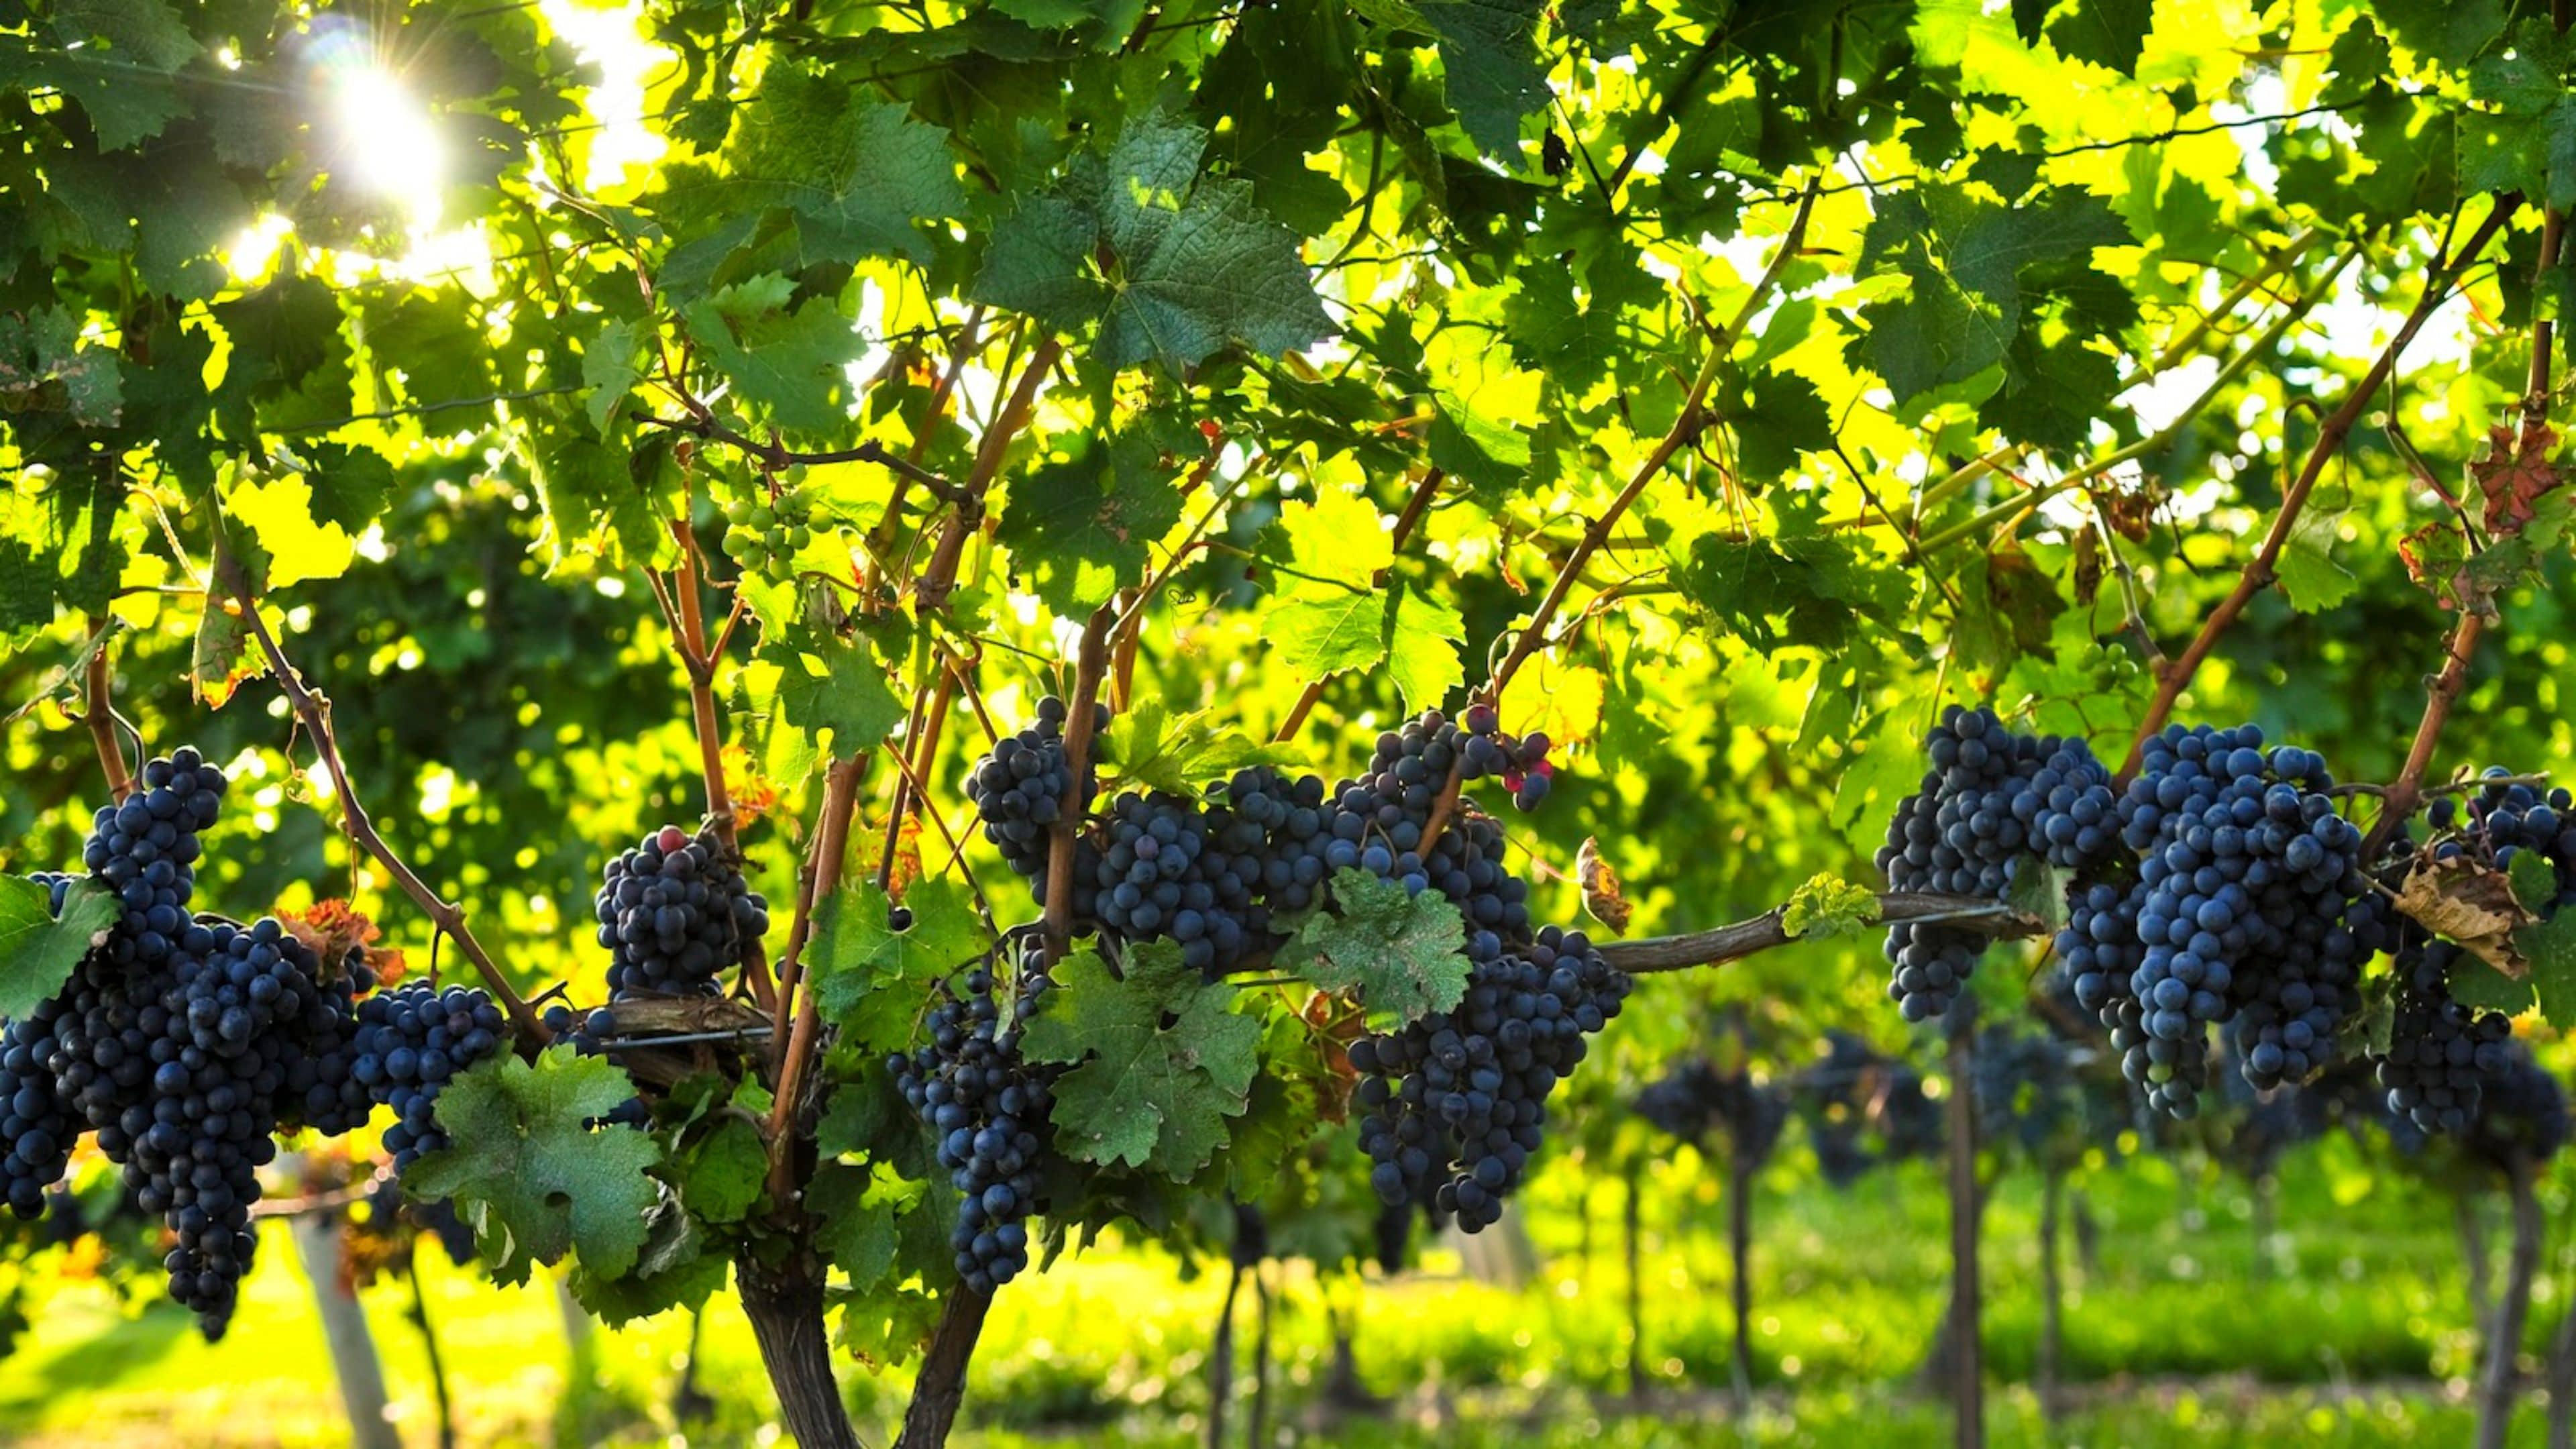 Удобрения для винограда подкормка корневая внекорневая признаки нехватки